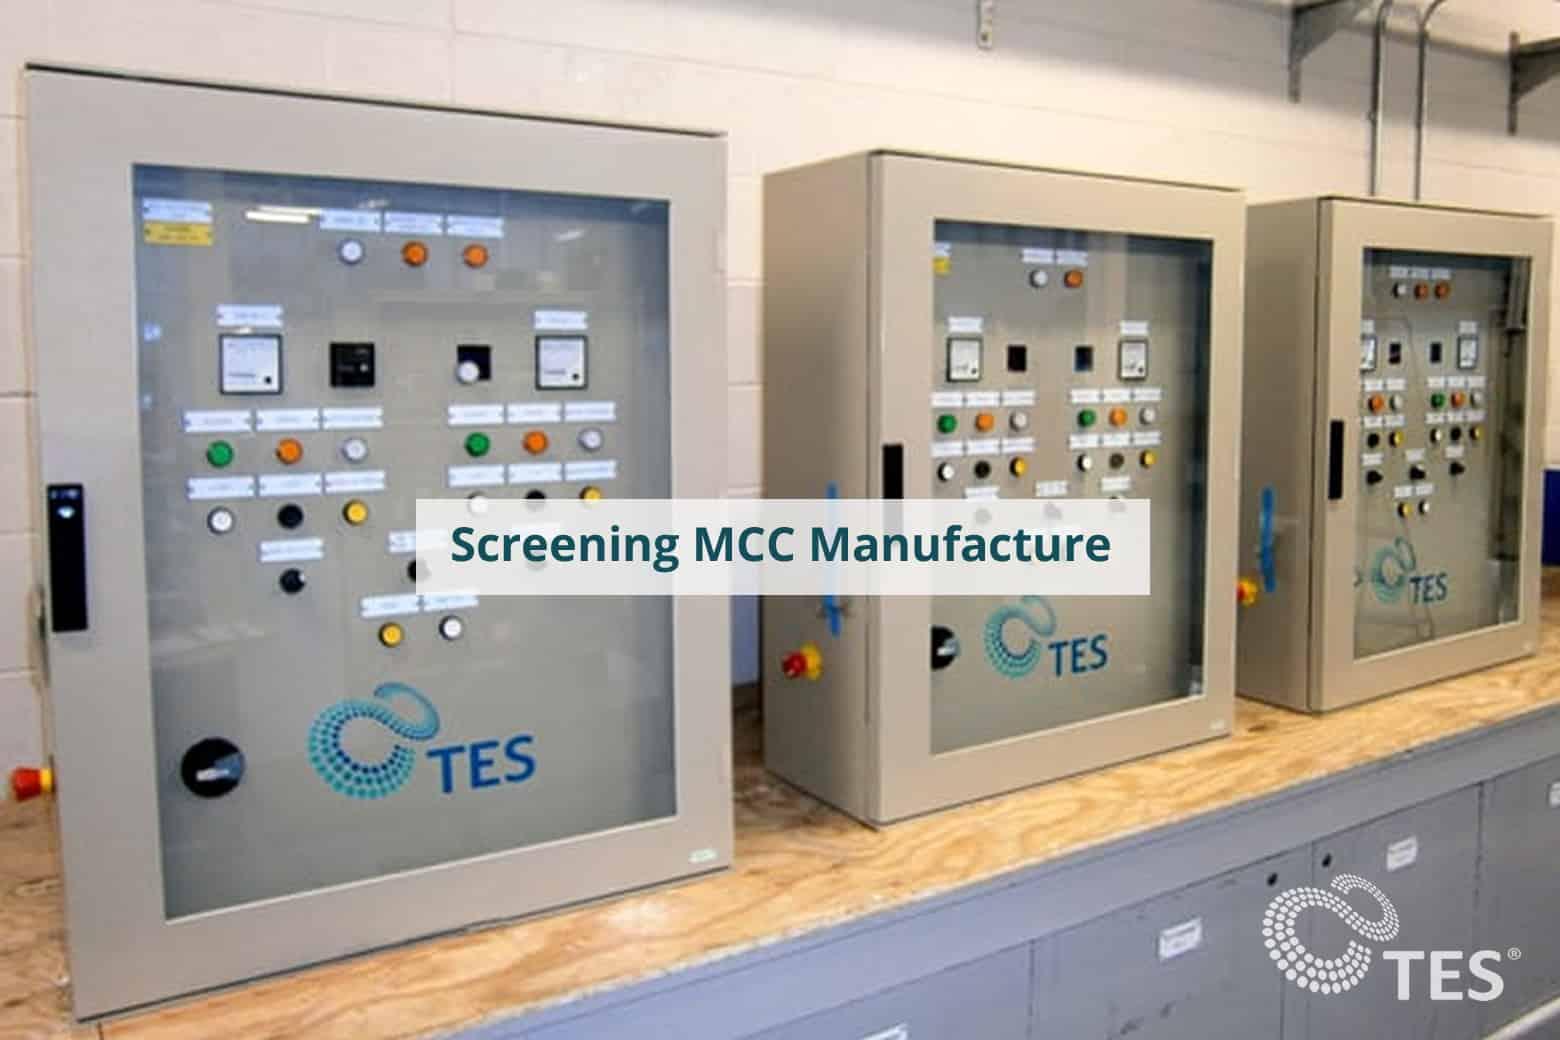 Screening MCC Manufacture